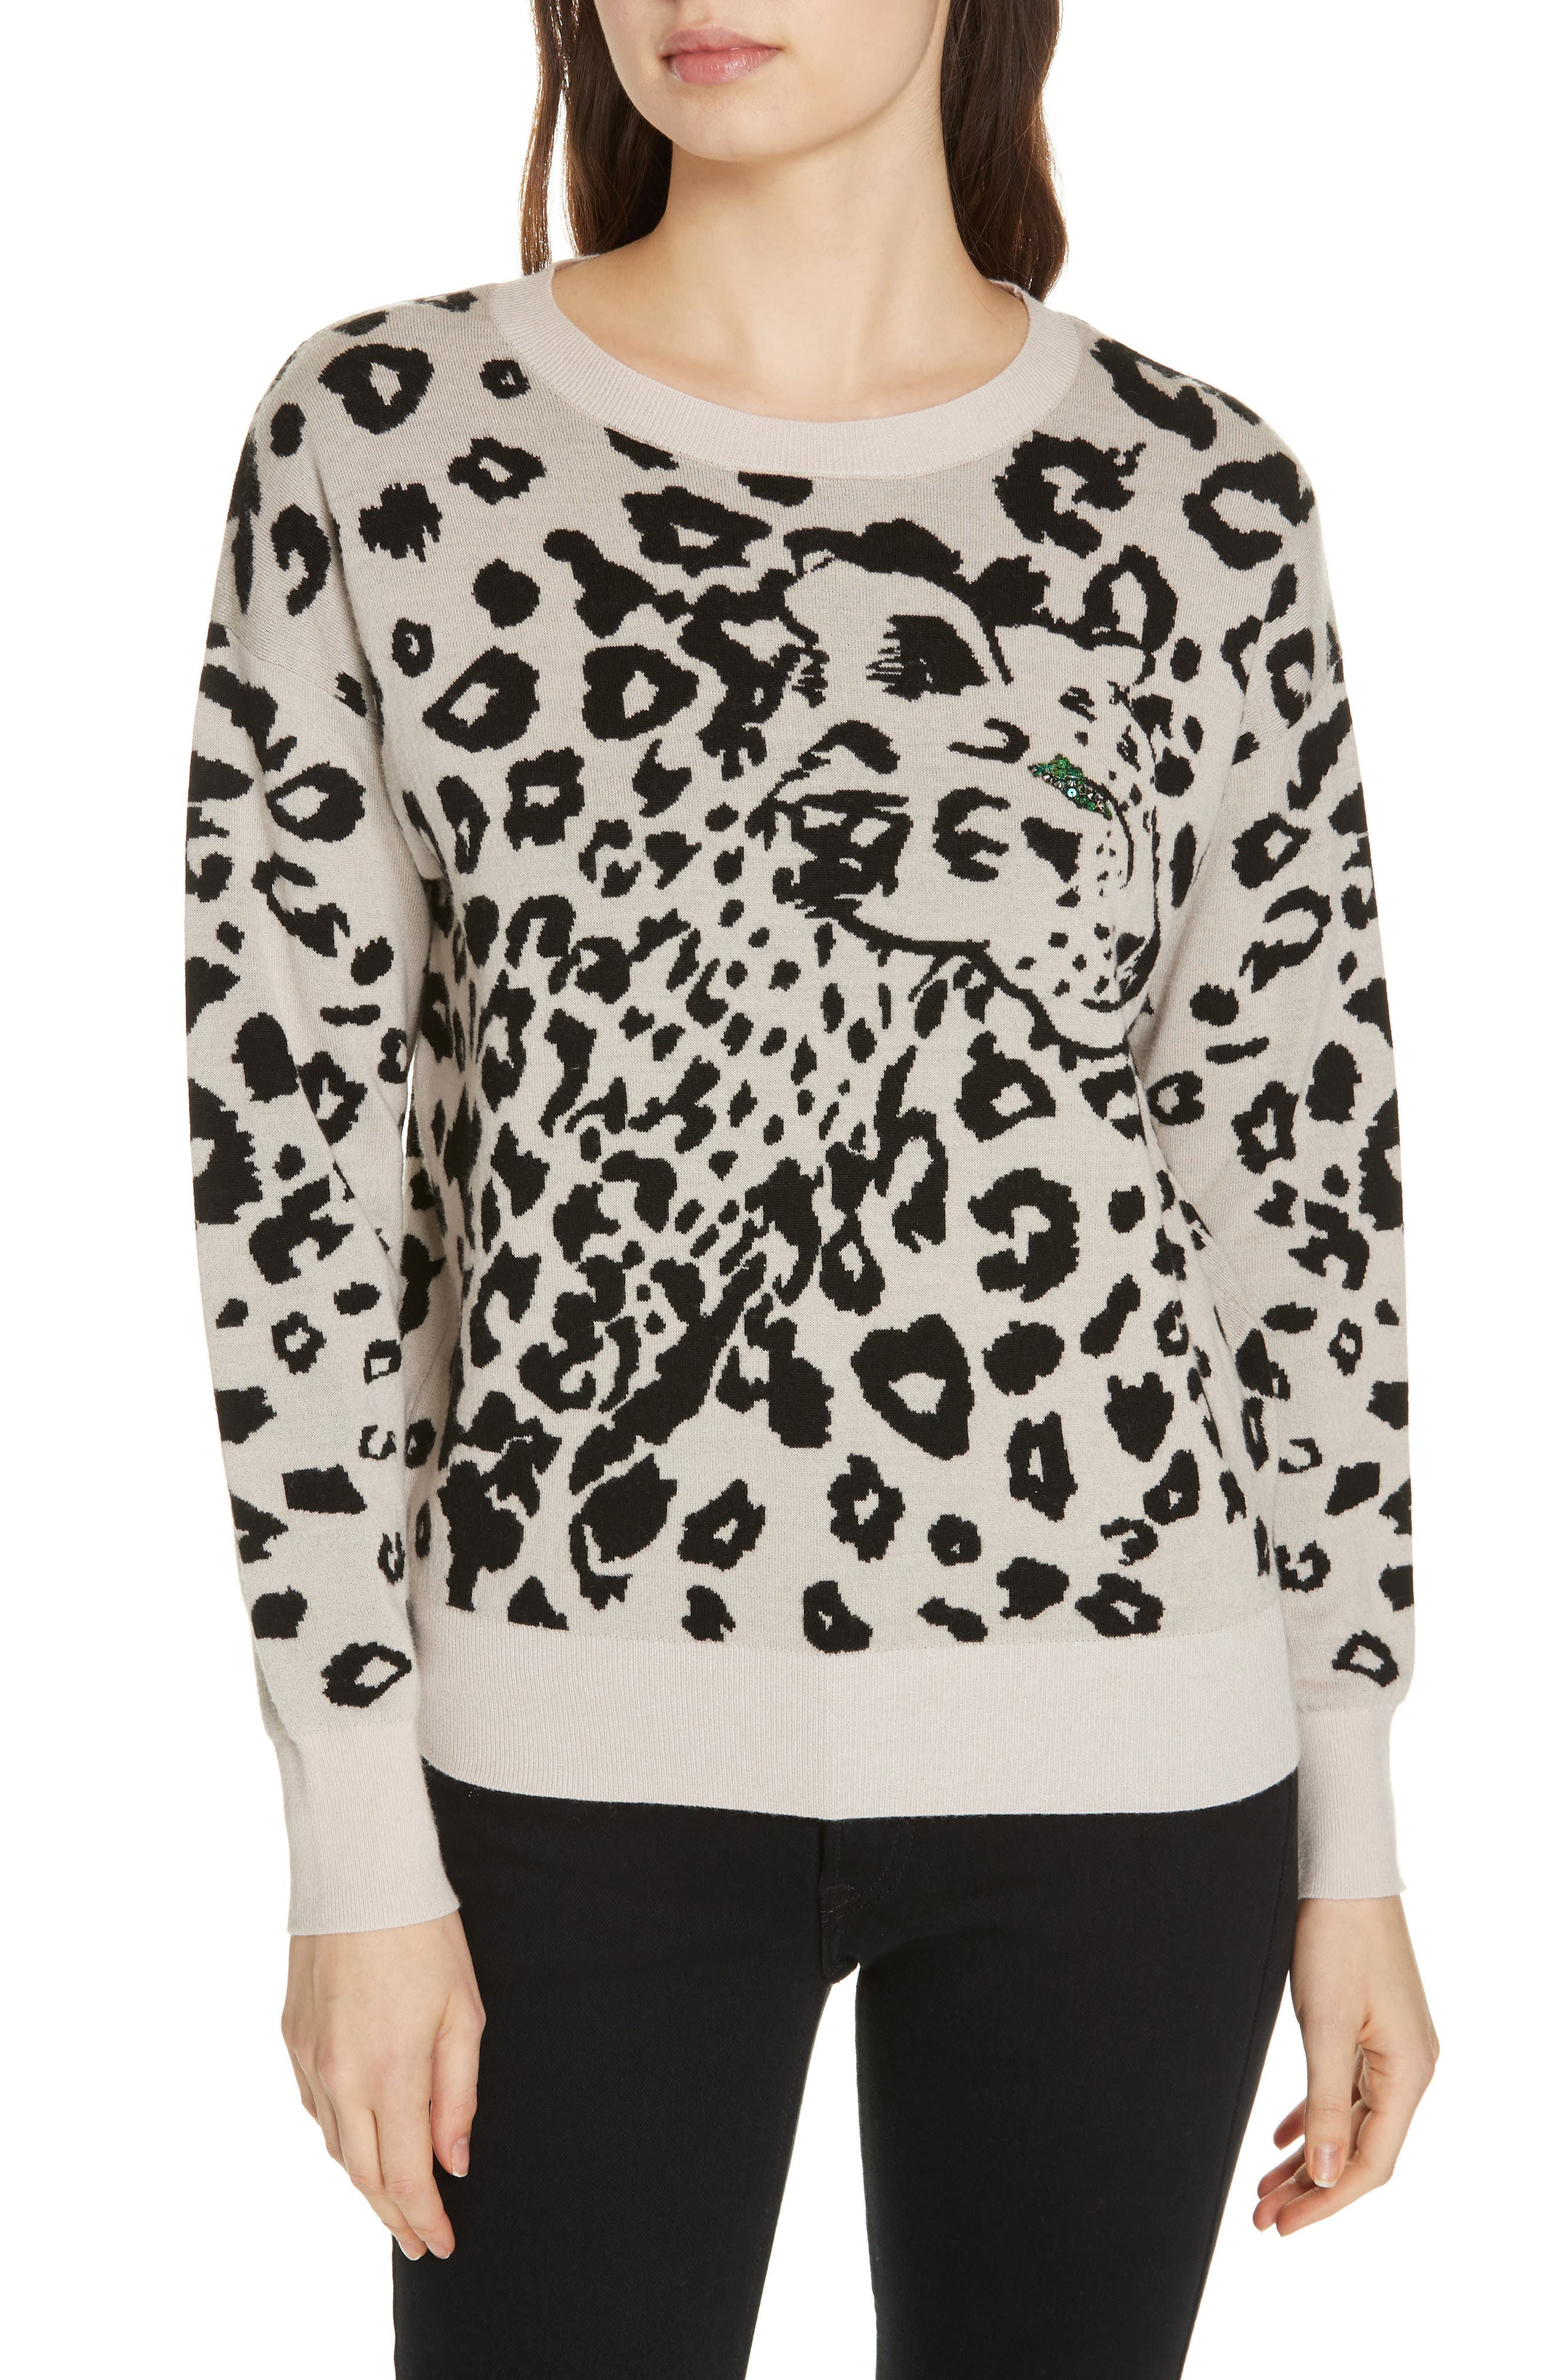 Animal Jacquard Wool Pullover Sweater in Cream/ Black